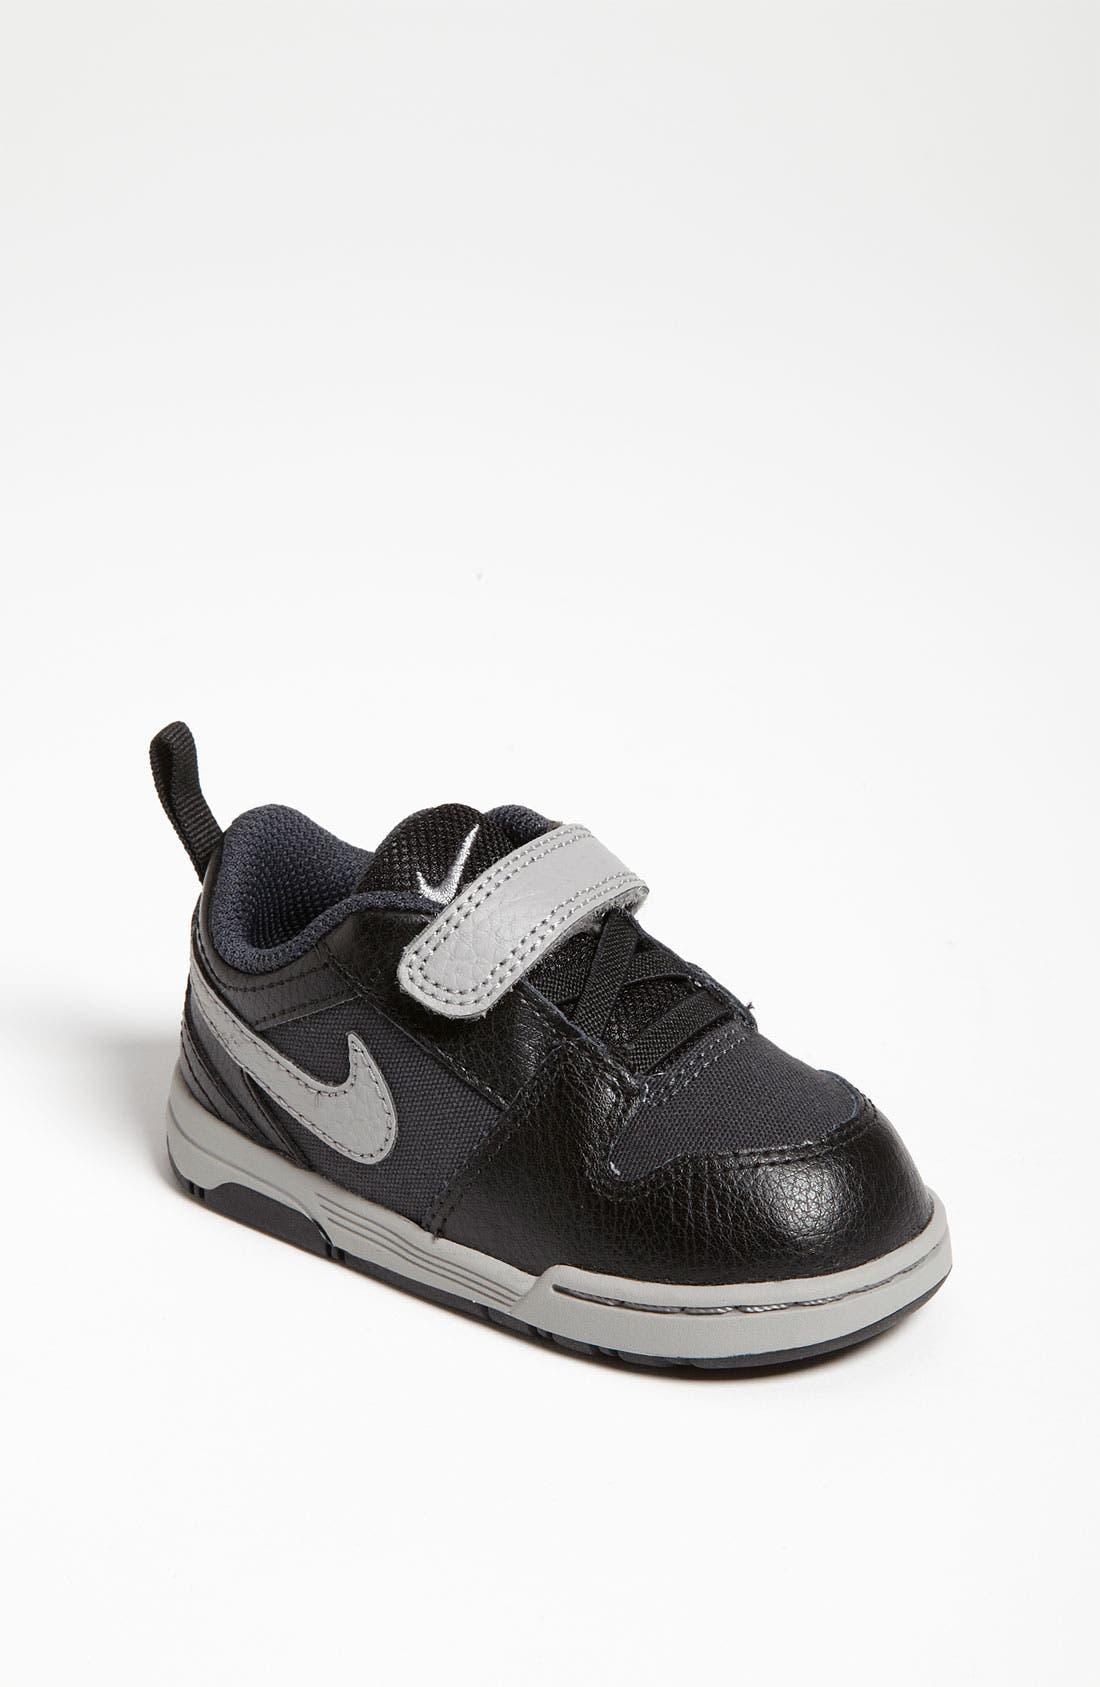 Alternate Image 1 Selected - Nike 'Mogan 3' Sneaker (Baby, Walker & Toddler)